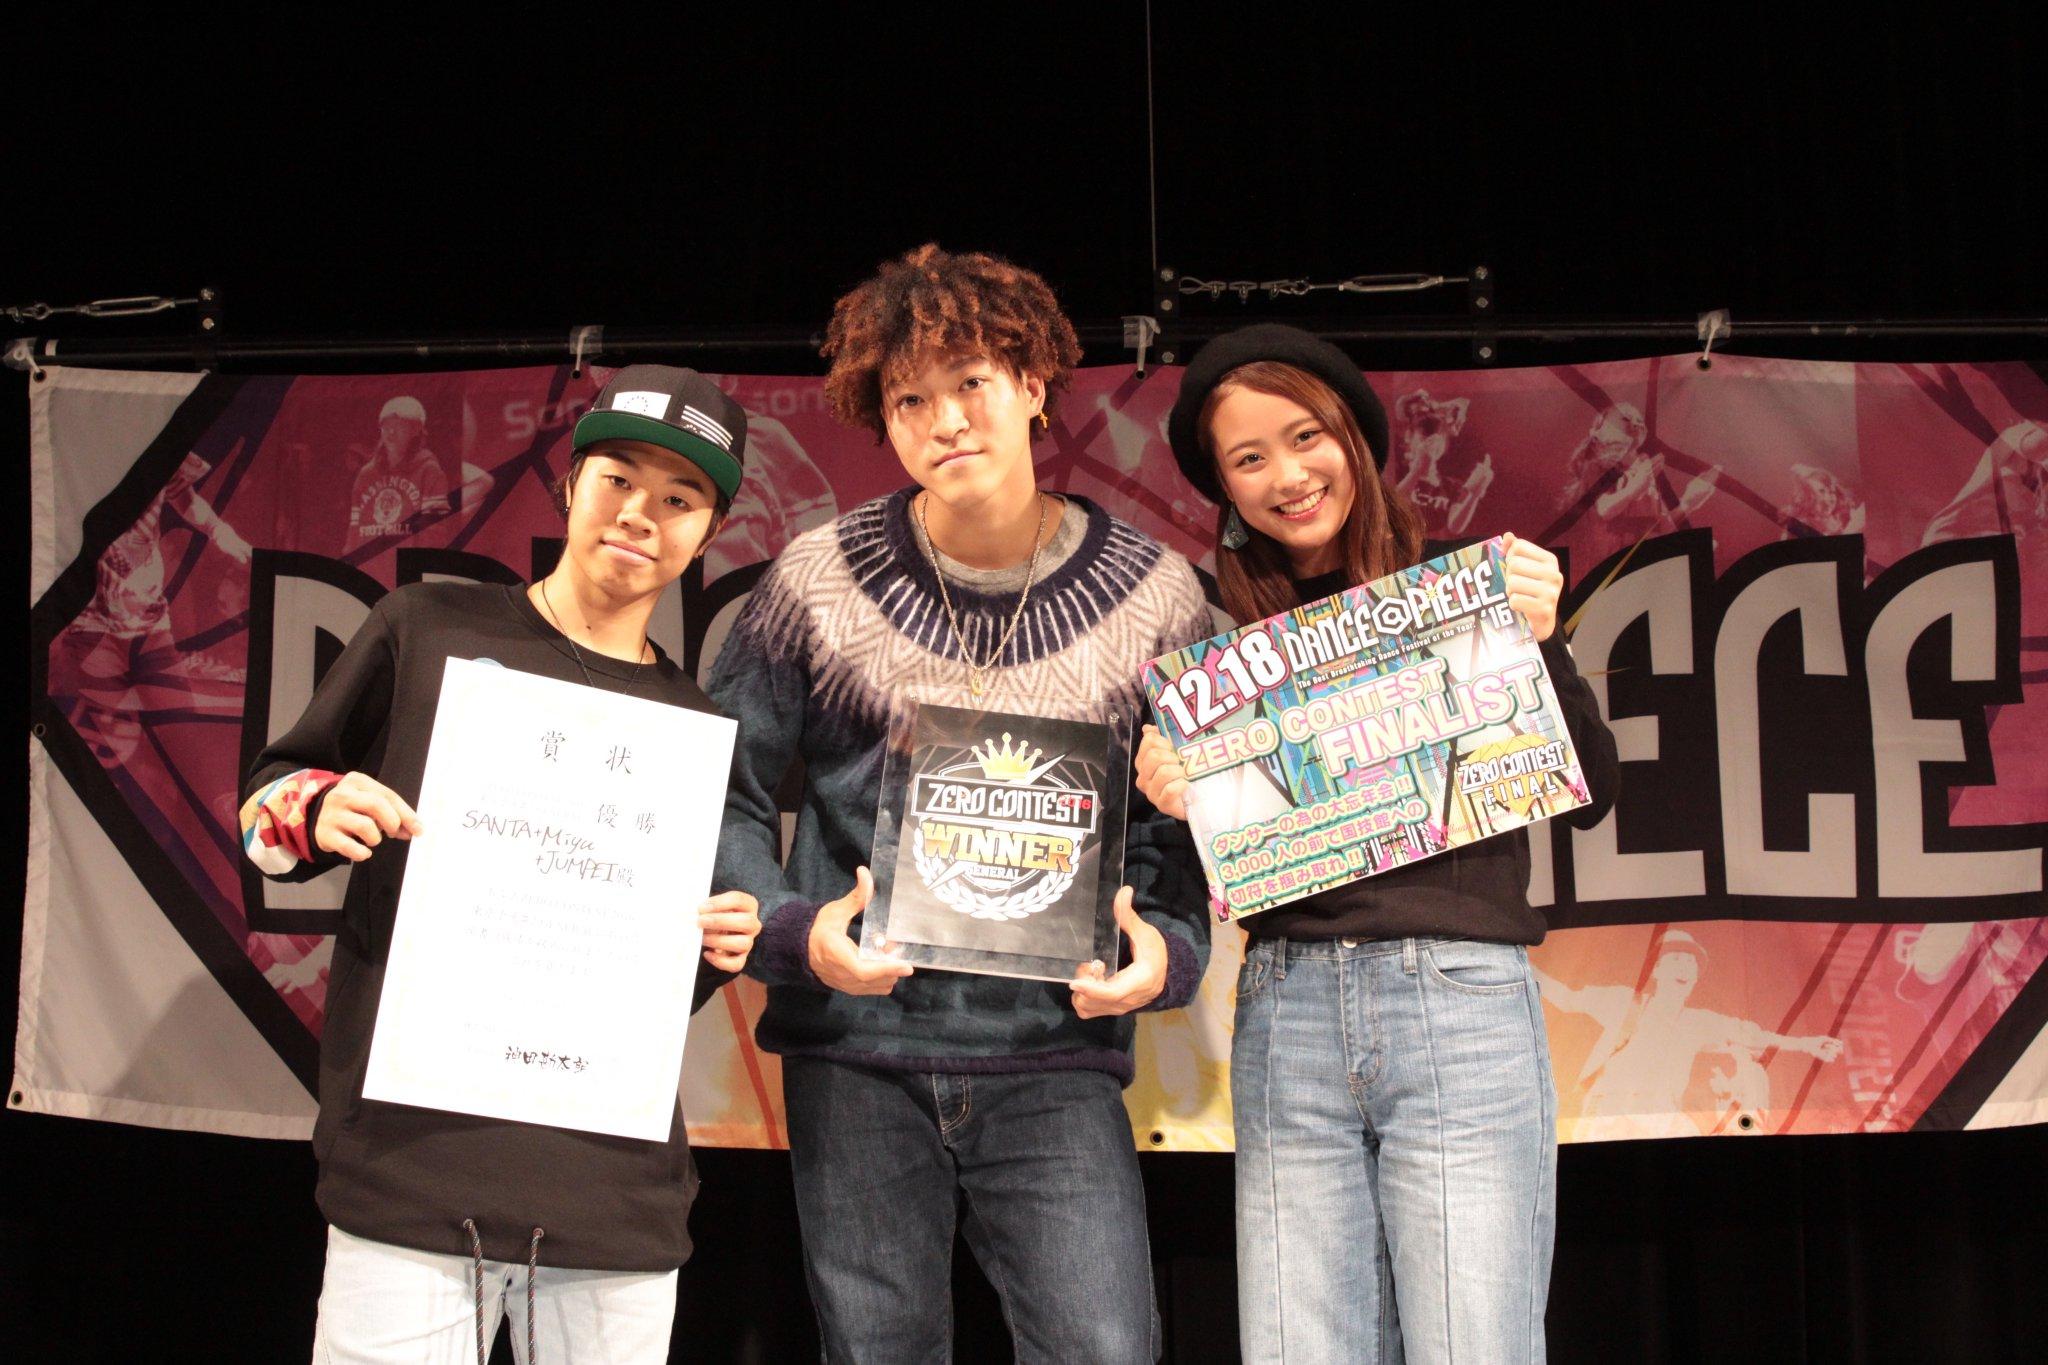 SANTA+Miyu+JUMPEIがZERO CONTESTで圧巻のショーケースを披露!